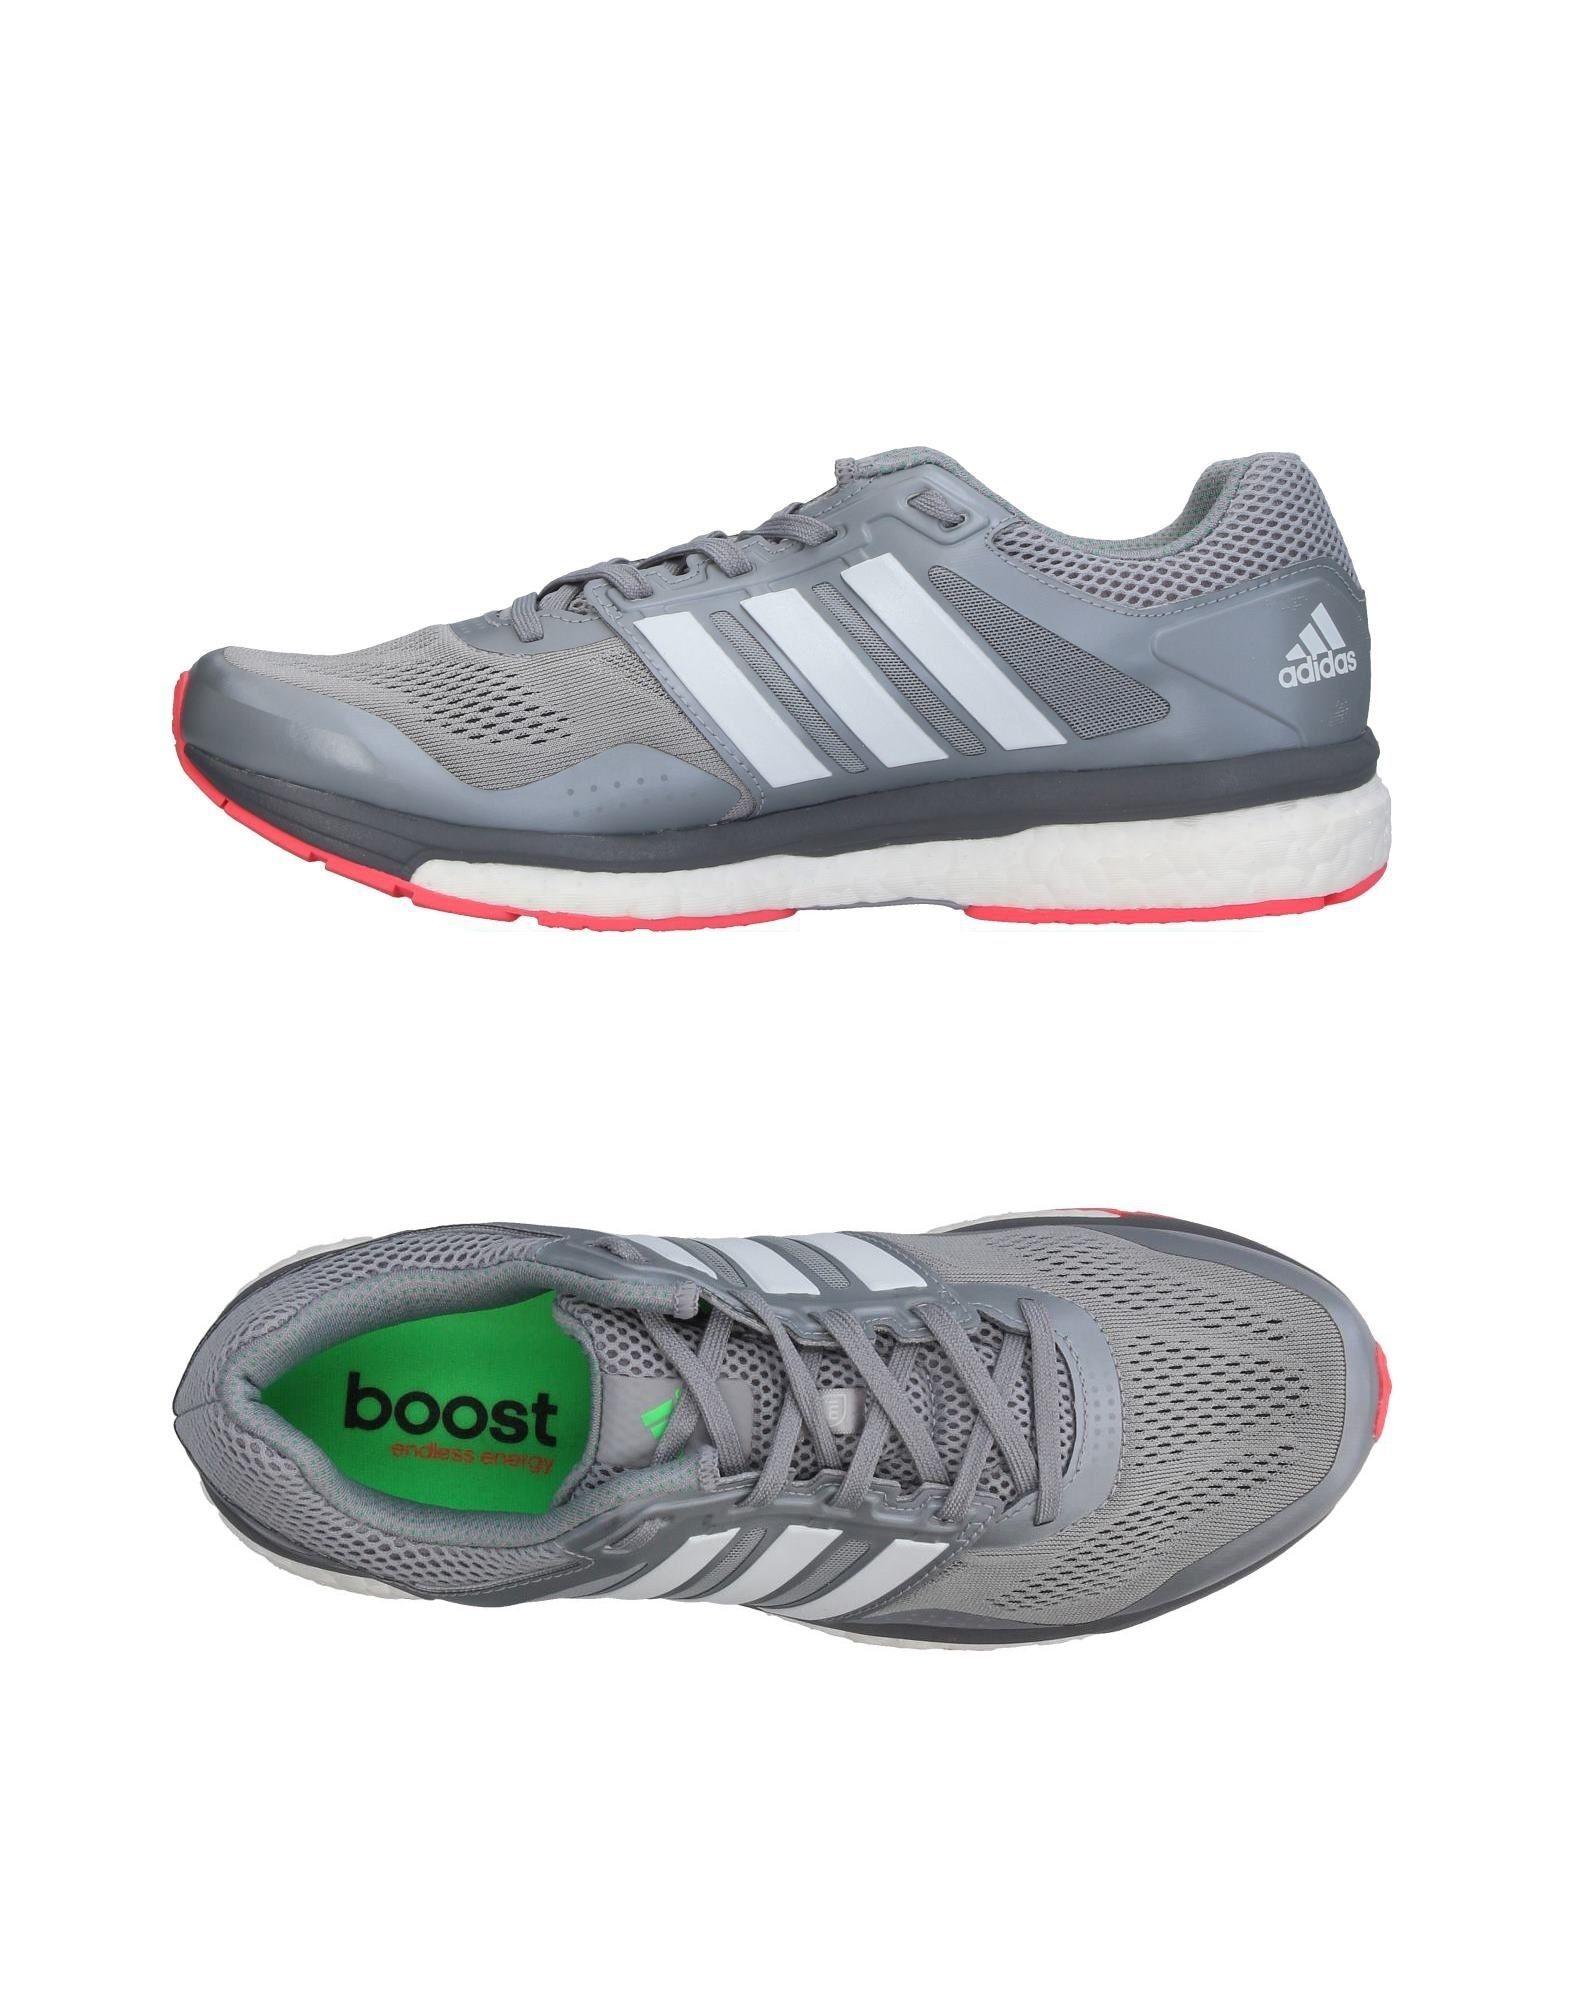 premium selection ad4e5 affeb Adidas Παπουτσια Παπούτσια Τένις Χαμηλά